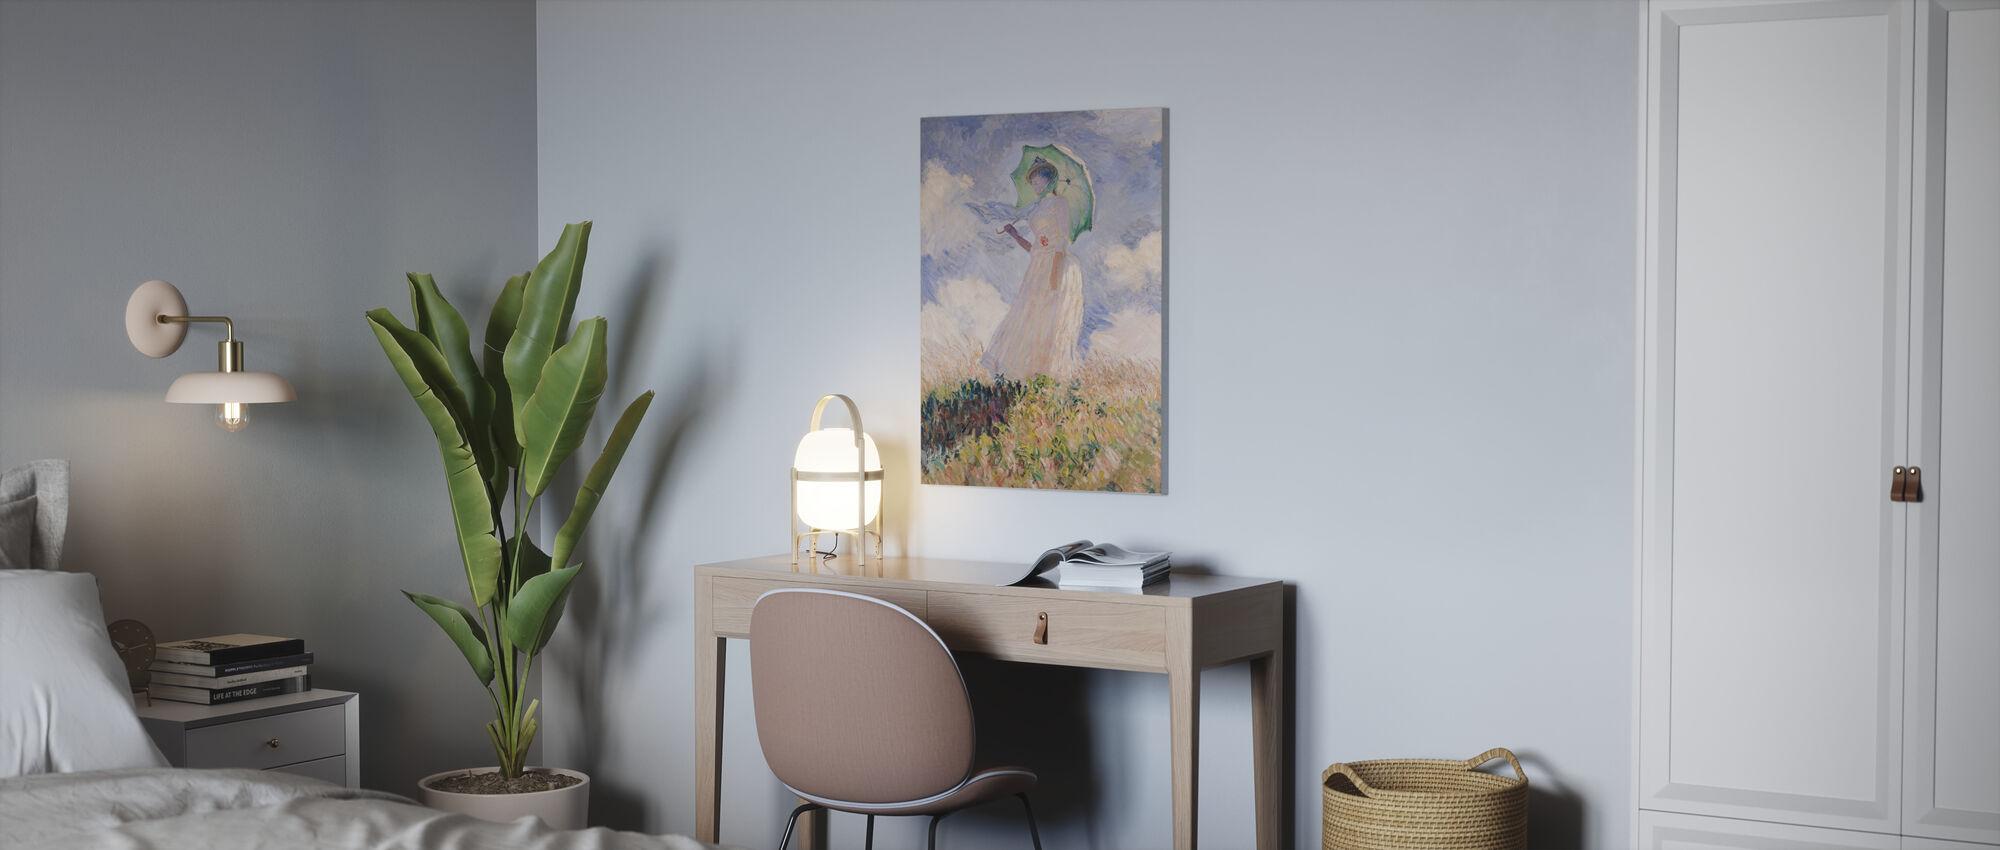 Woman with Parasol, Claude Monet - Canvas print - Office